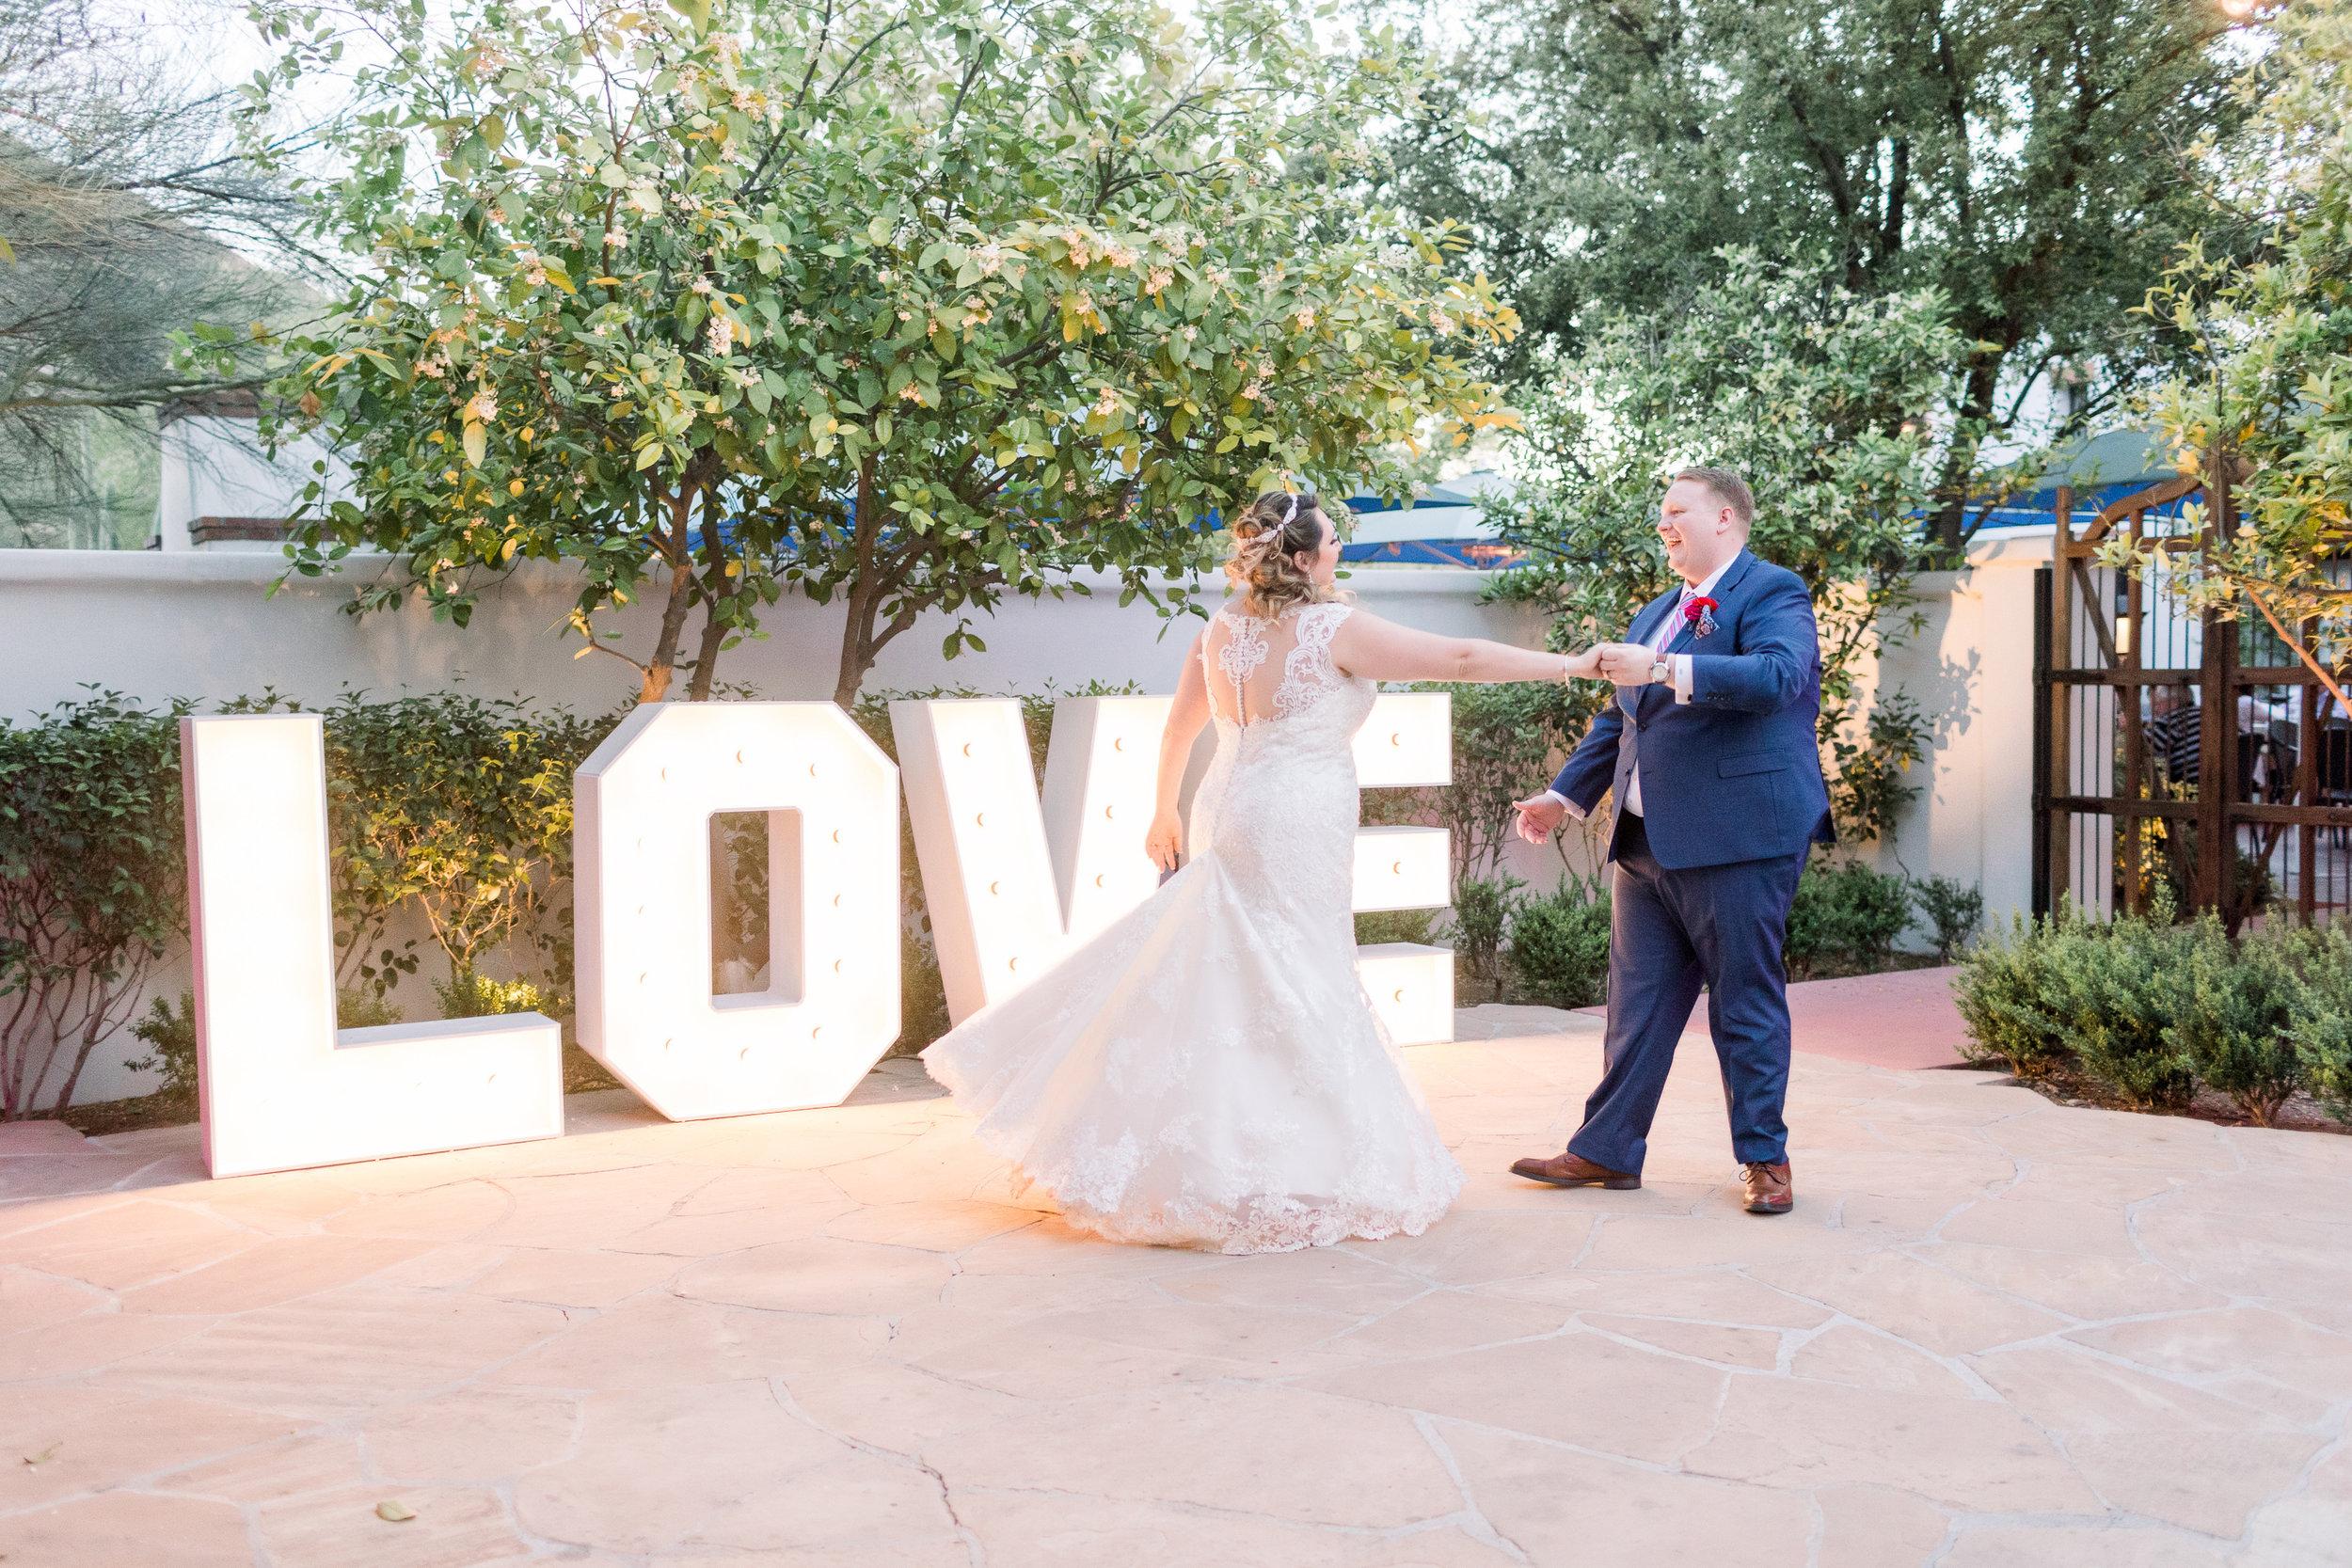 Roxanne and Brandon's El Chorro Wedding - Arizona florist Phoenix scottsdale Mesa chandler Sedona Prescott - First Dance with Marquee Love sign